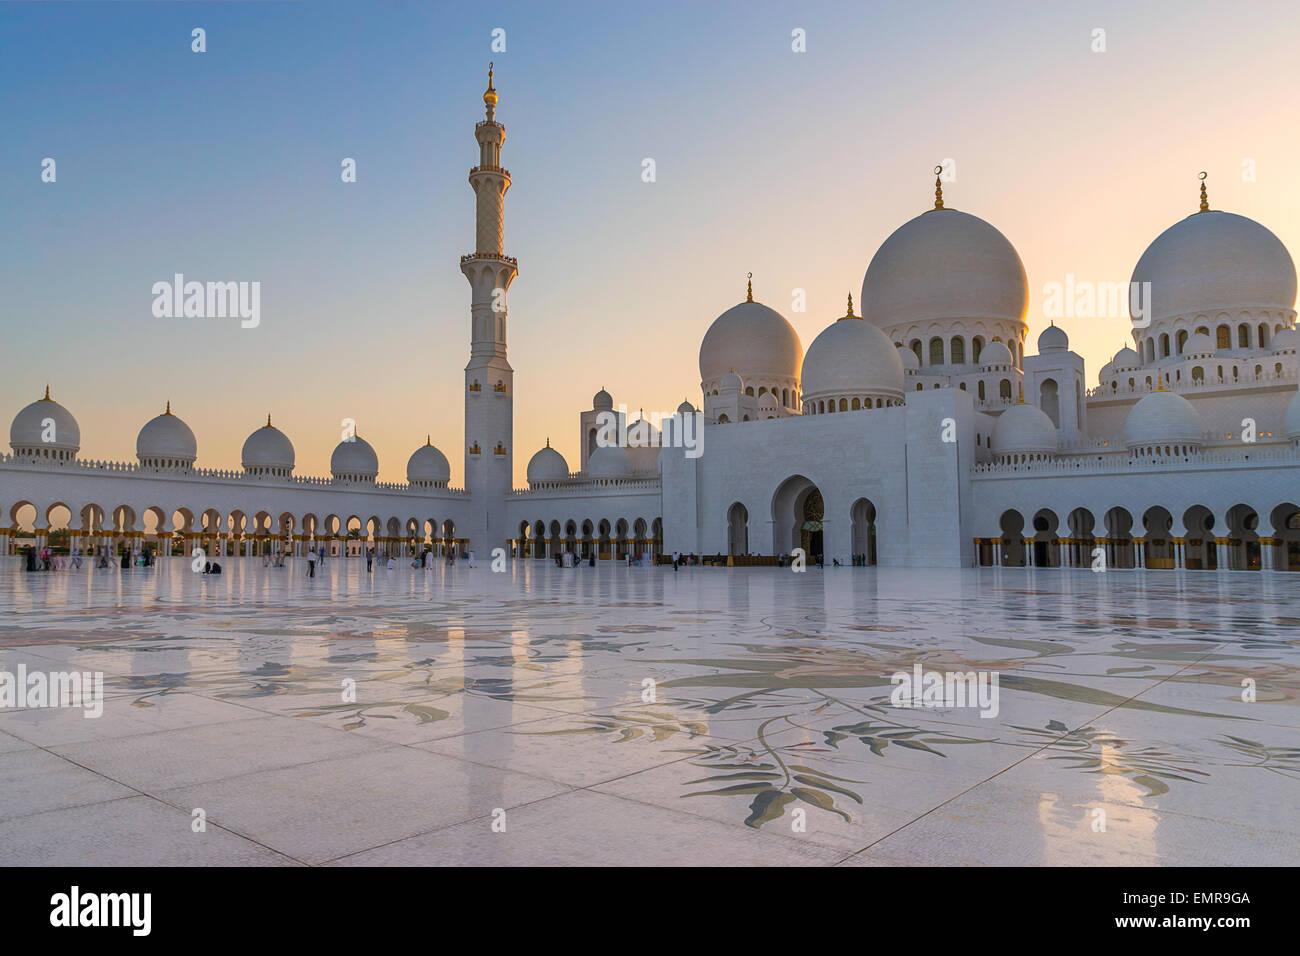 Sheikh Zayed Grand Mosque - Stock Image